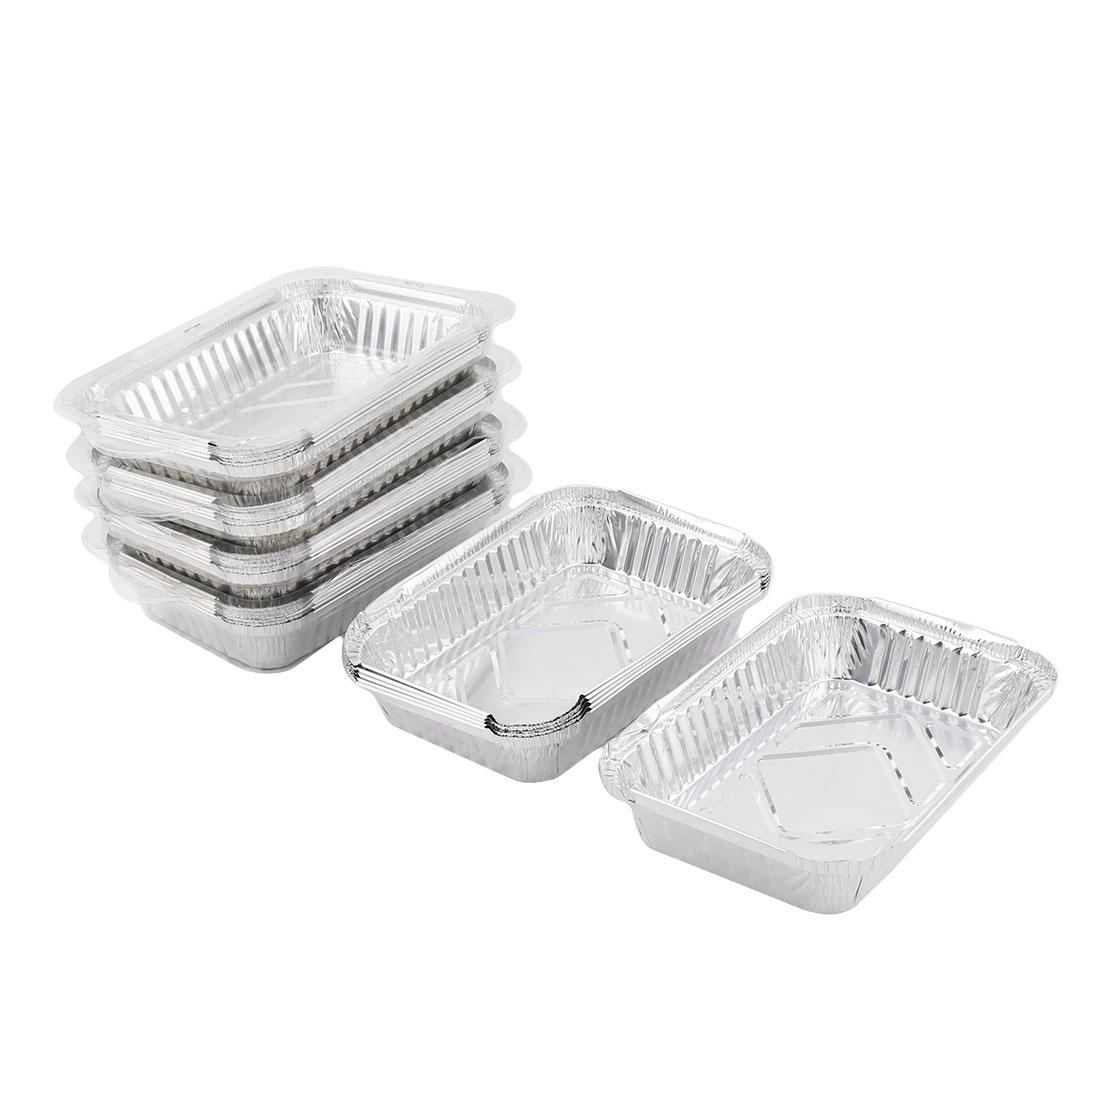 Outdoor Picnic Aluminum Foil Disposable Food Container Silver Tone 650ml 30pcs